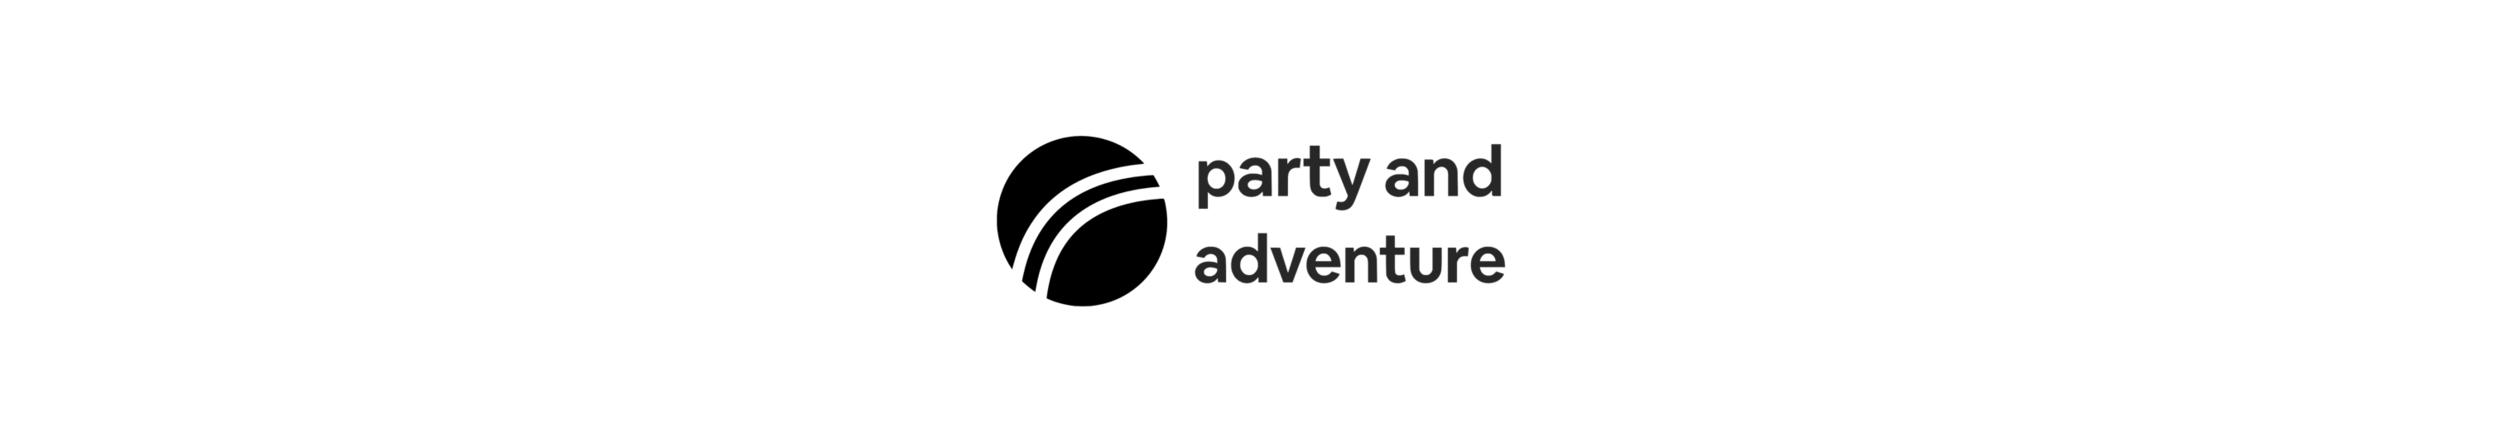 earth-logo-design.png